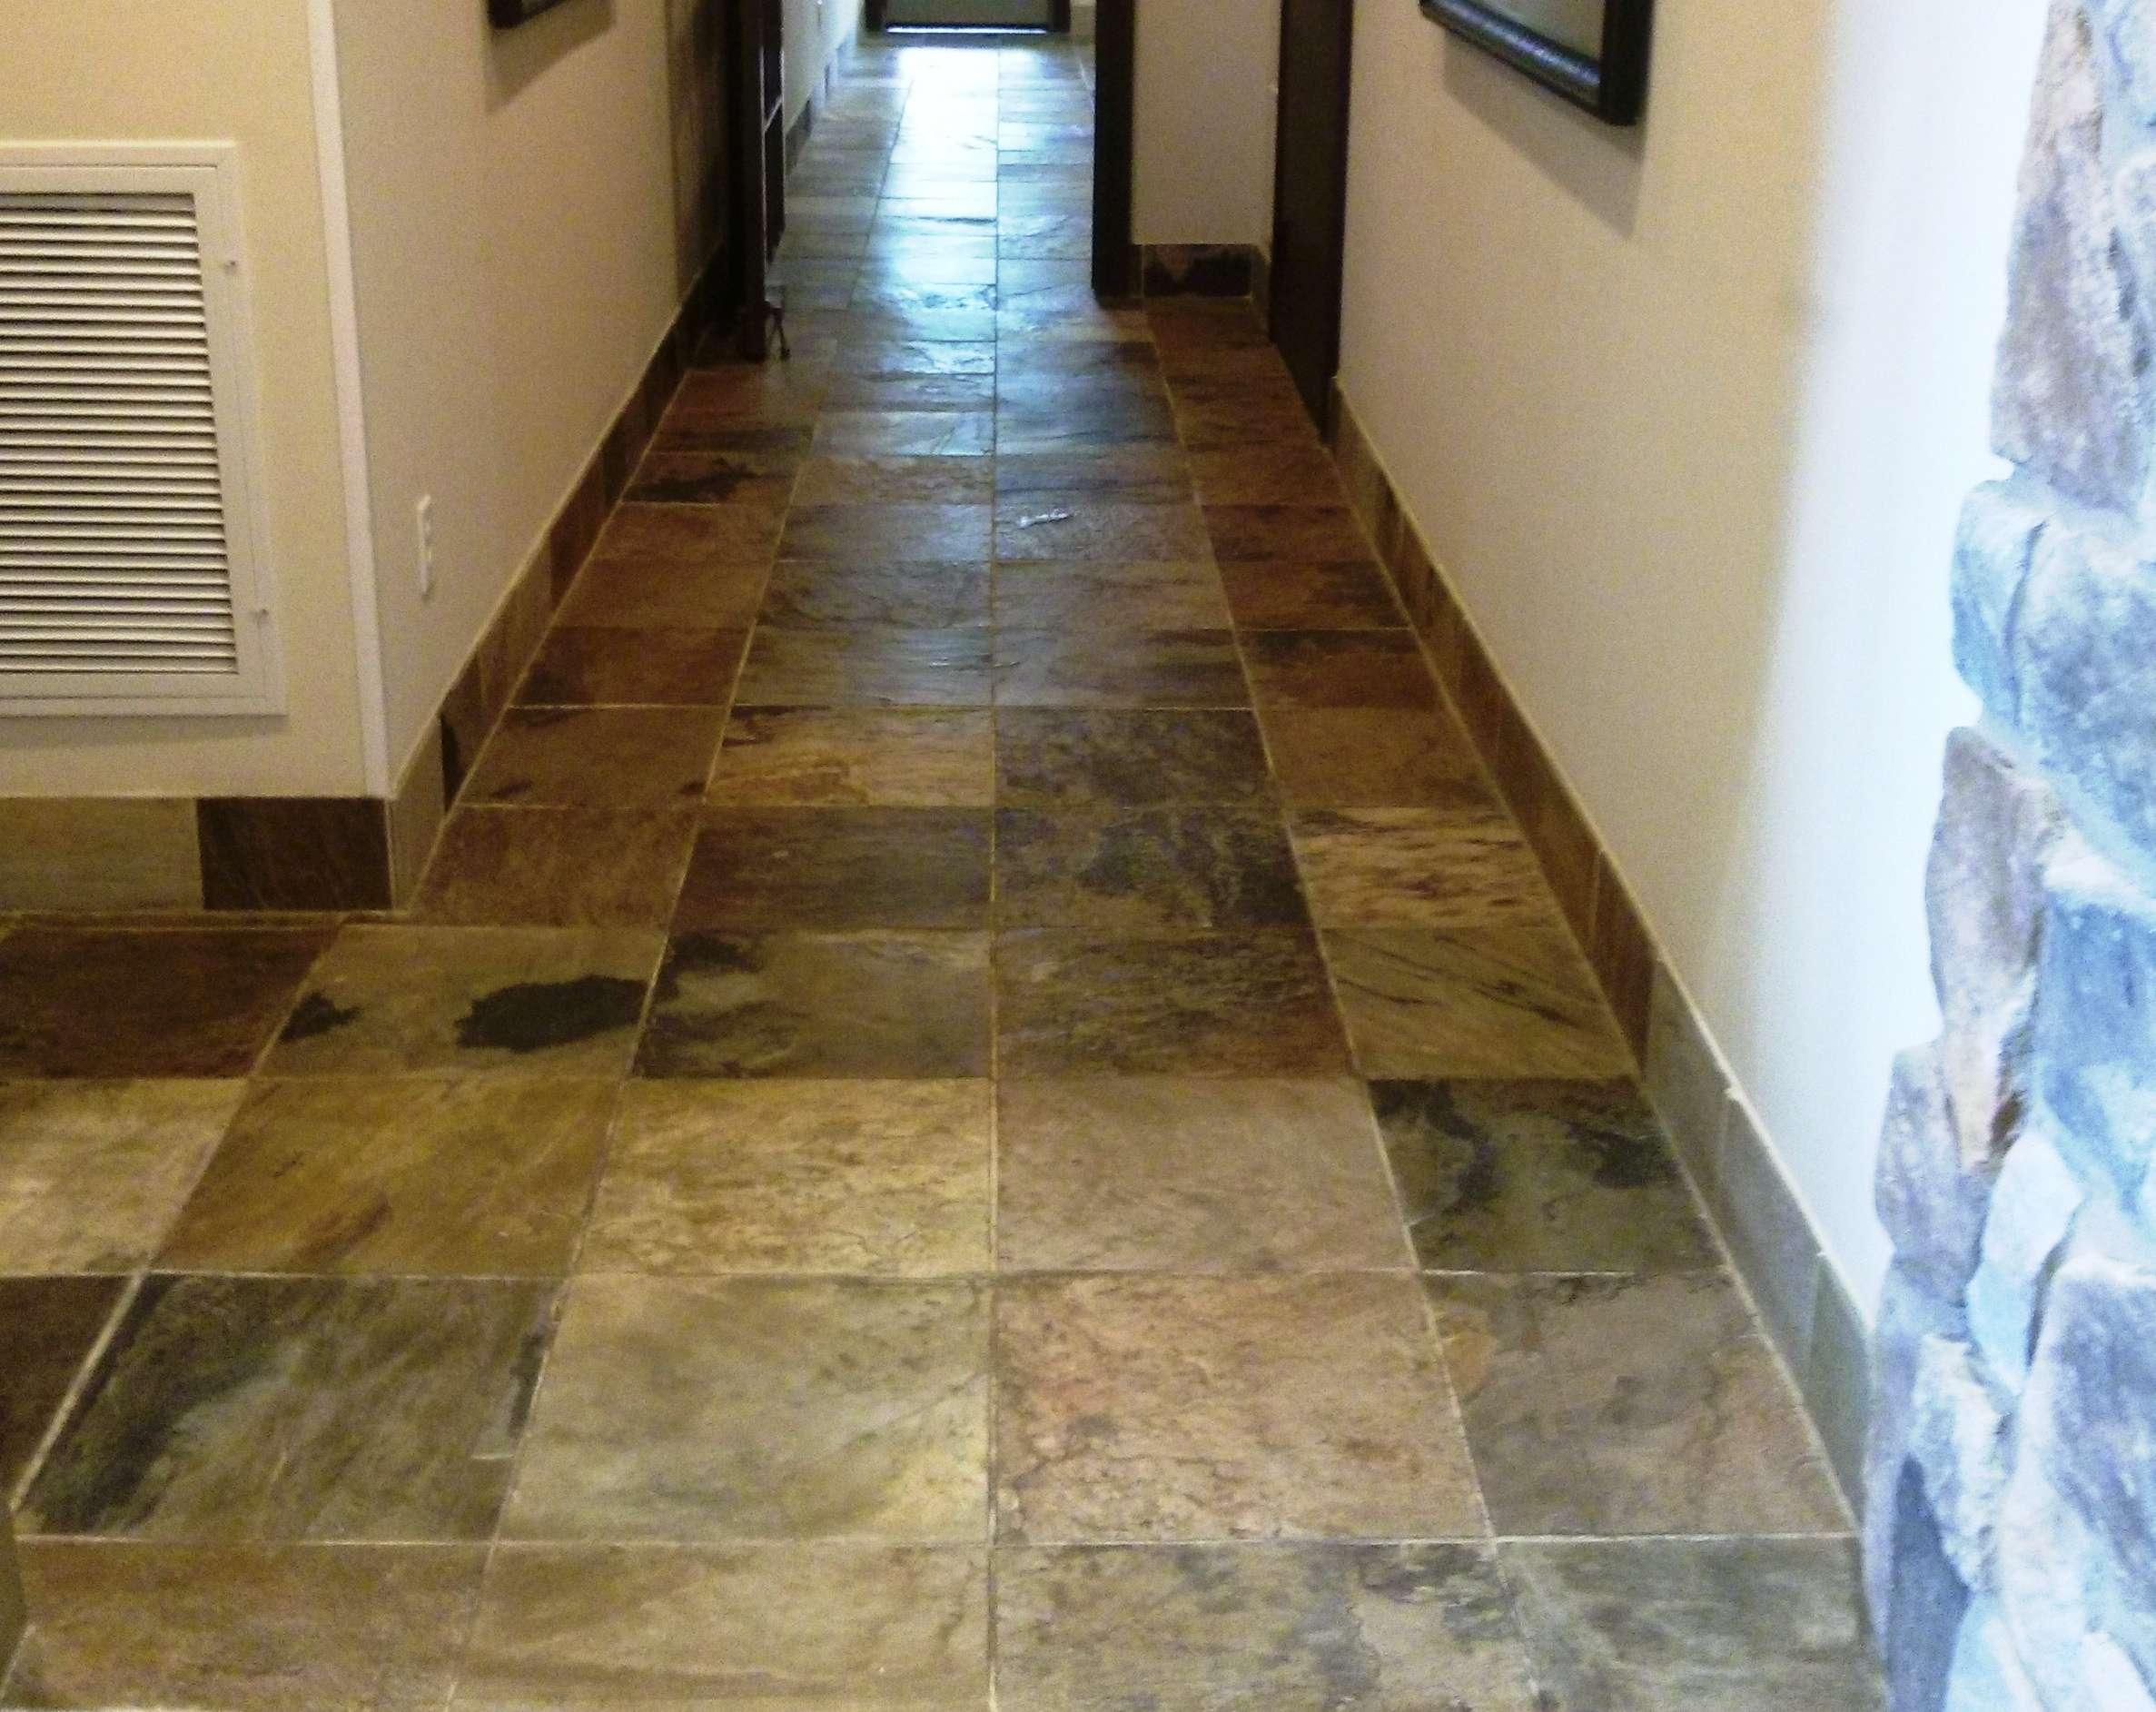 Slate Floor Tiles Need Penetrating Sealer